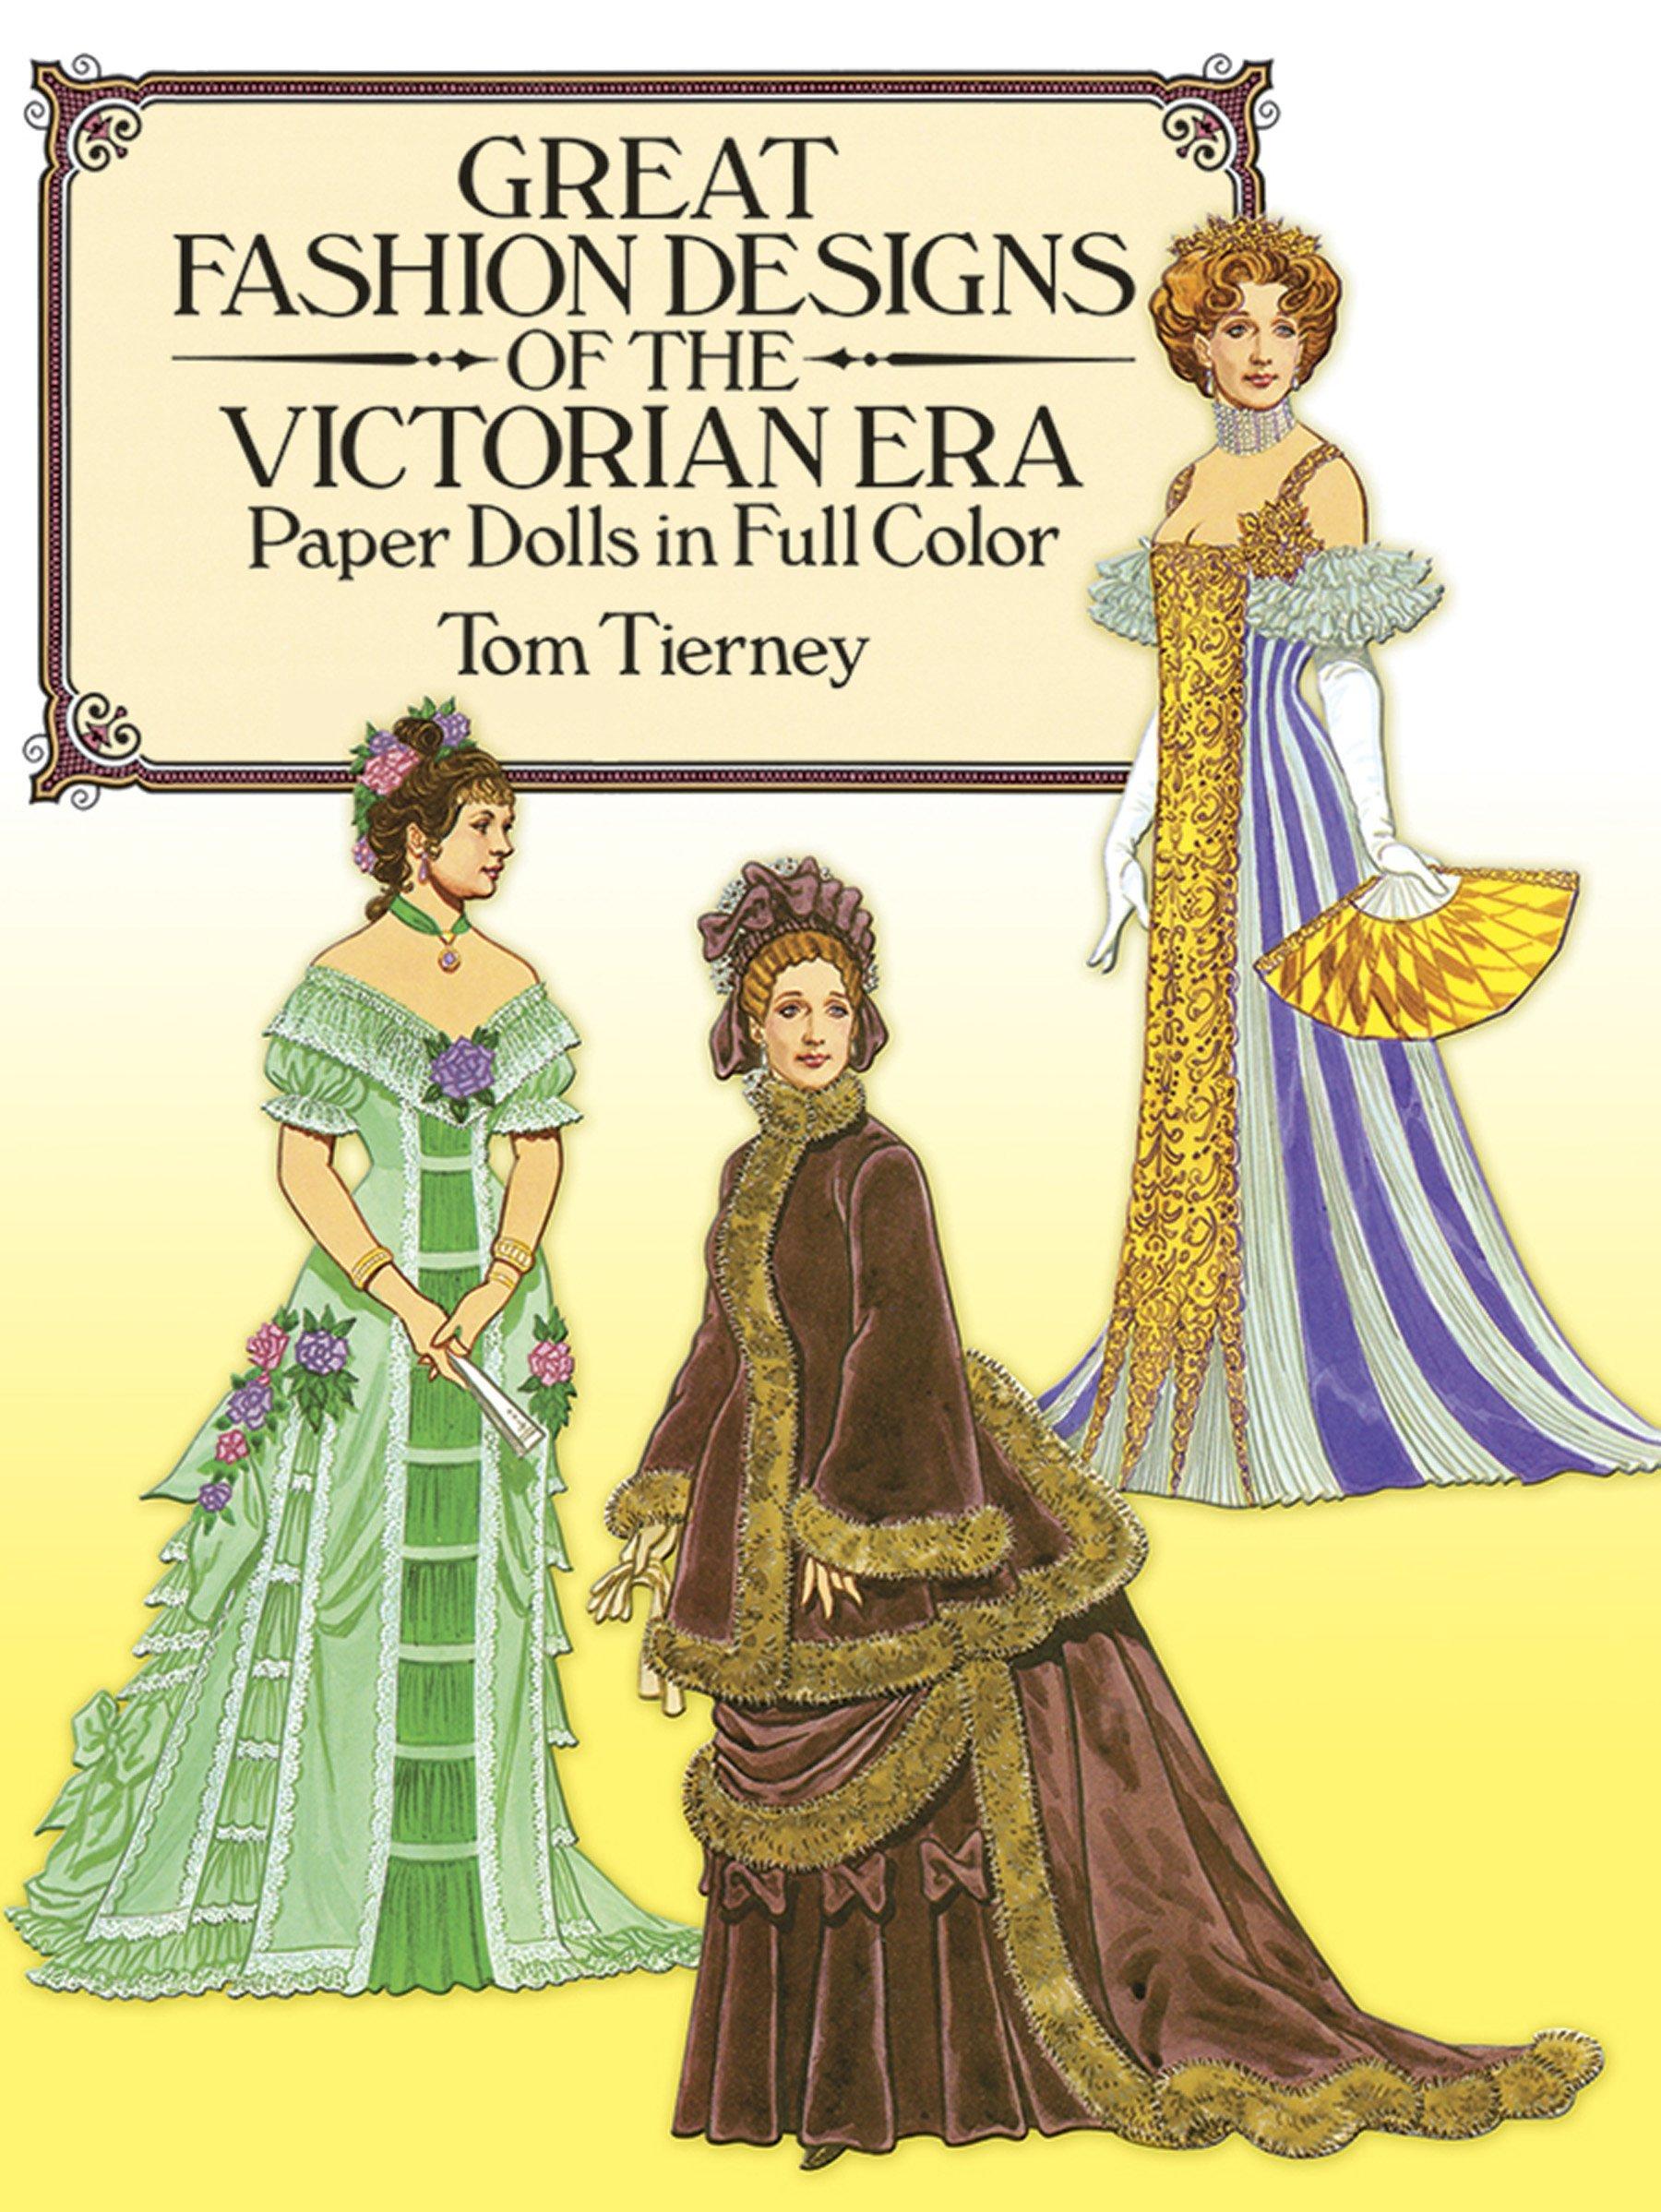 Great Fashion Designs of the Victorian Era Paper Dolls in Full Color: Papers Dolls in Full Color (Dover Victorian Paper Dolls)